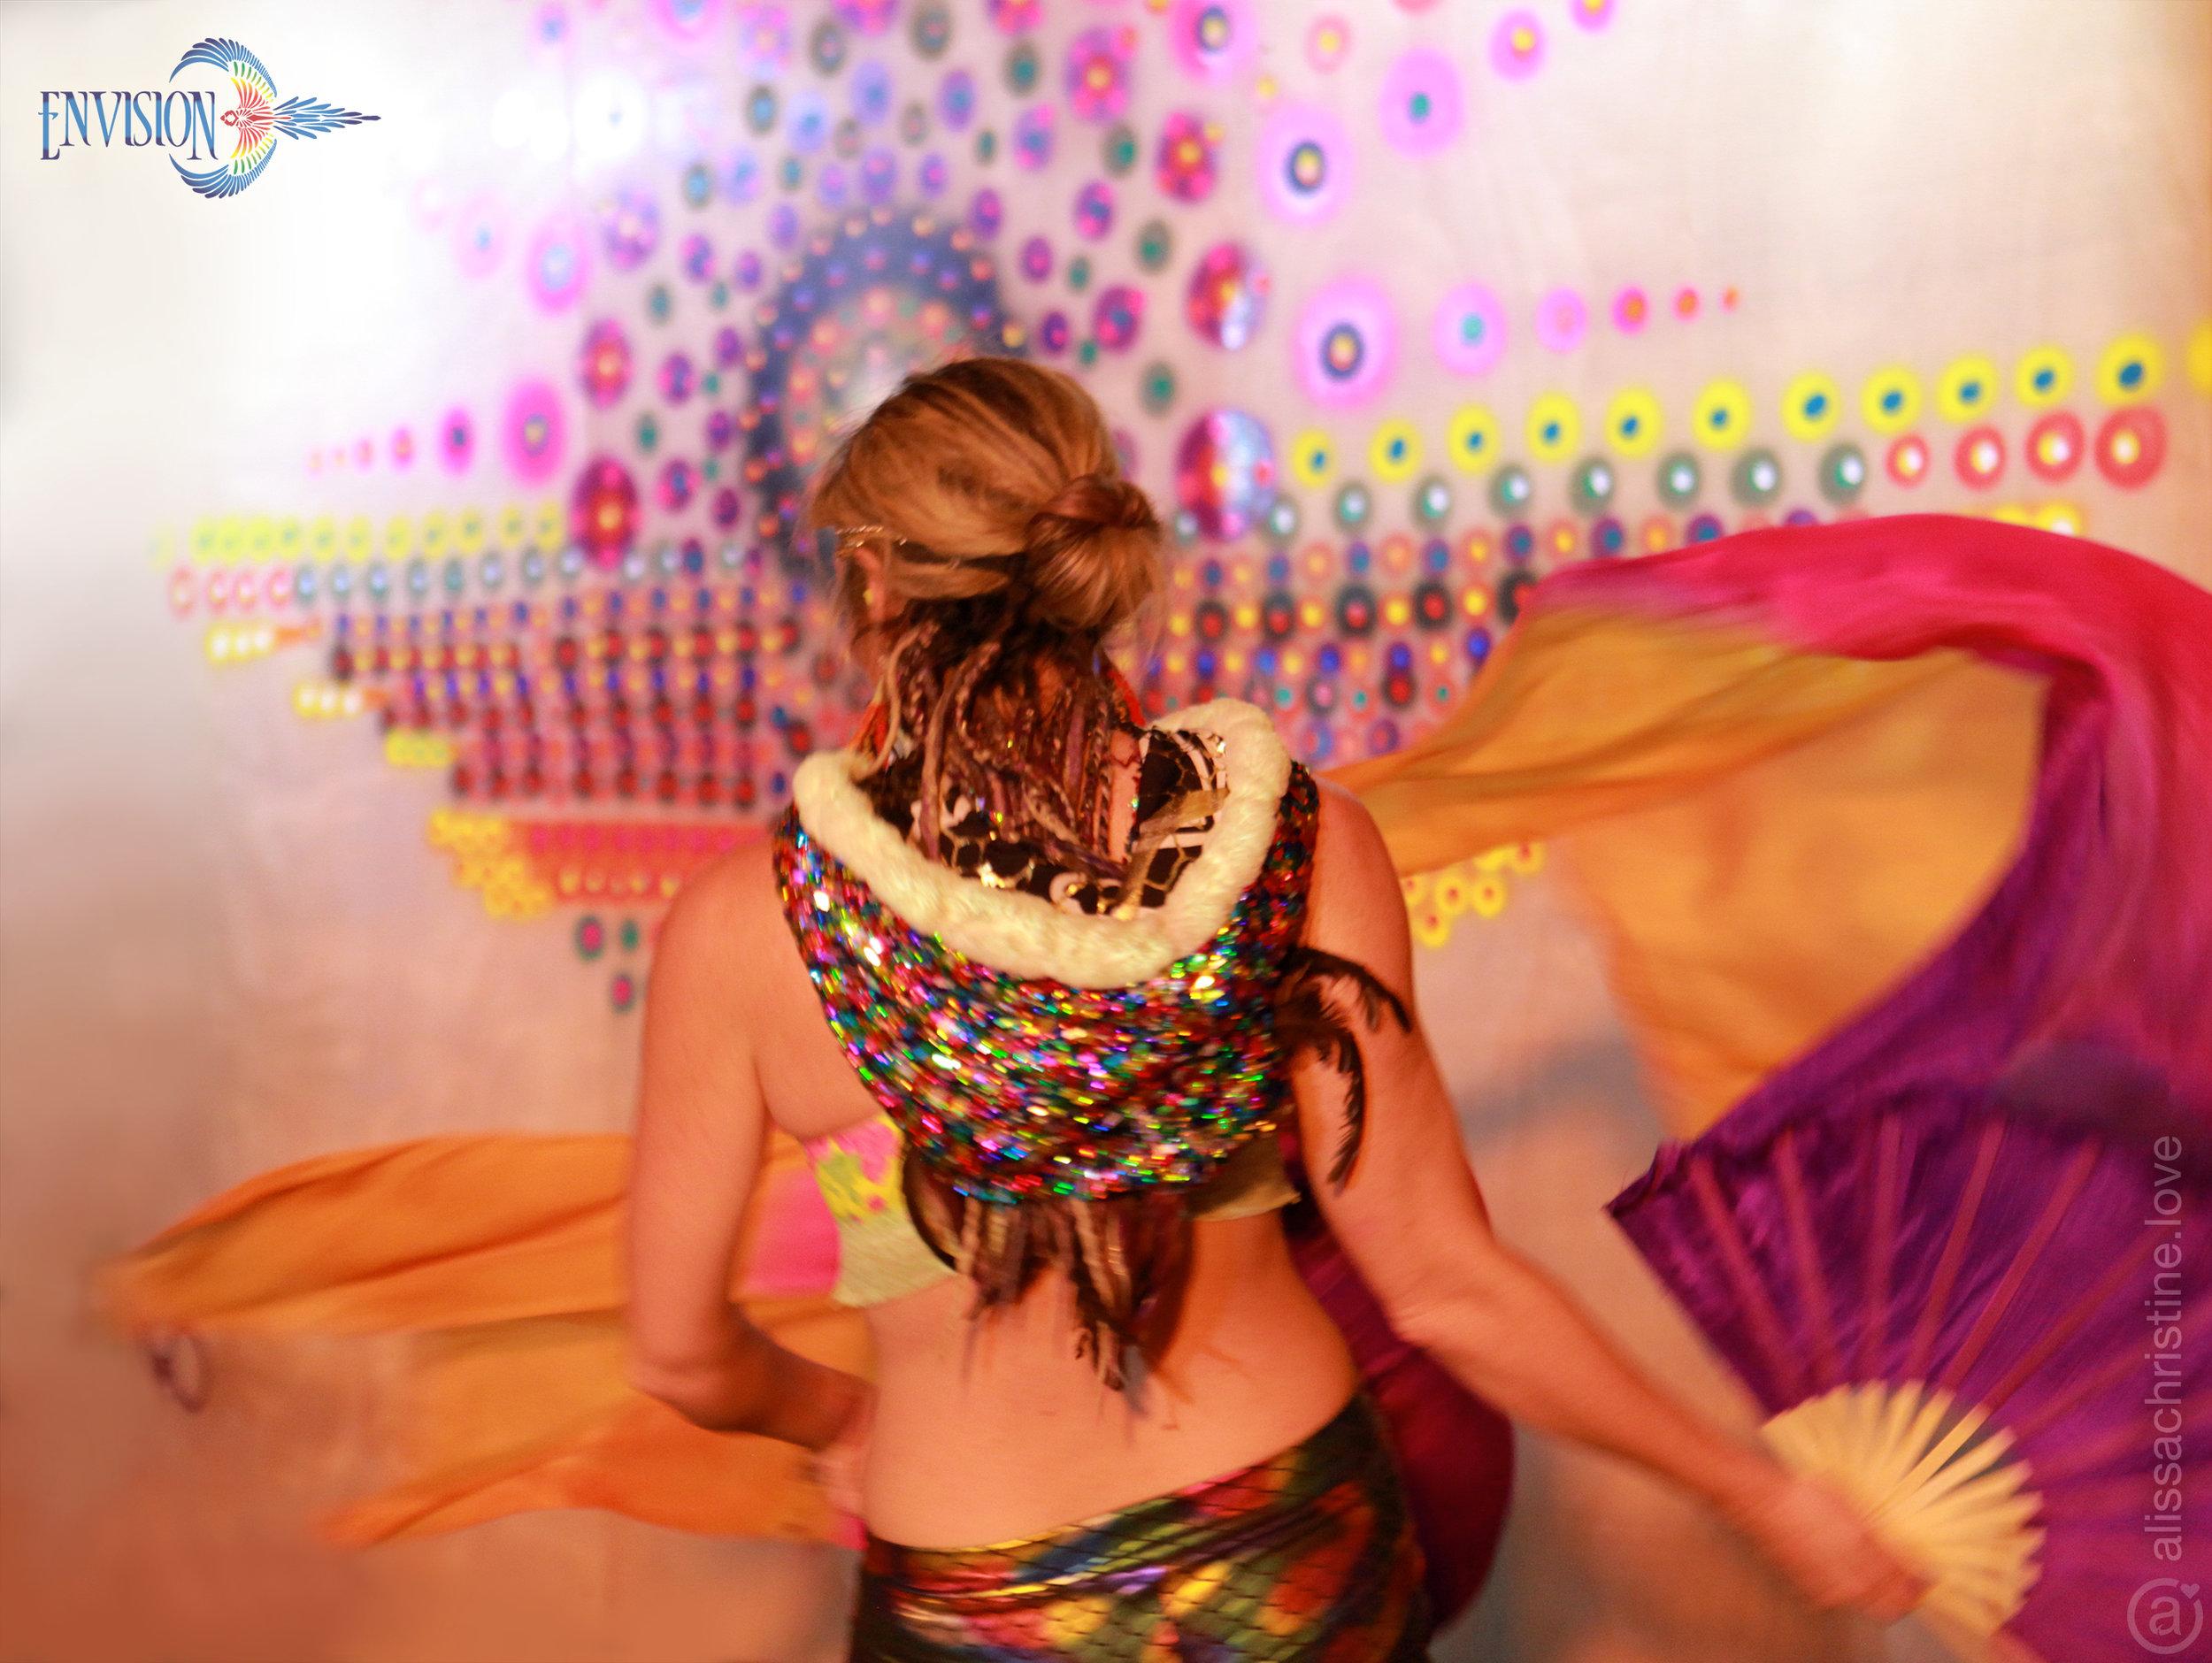 alissaChristine-ef-art-dancing-2017-8751-lo.jpg